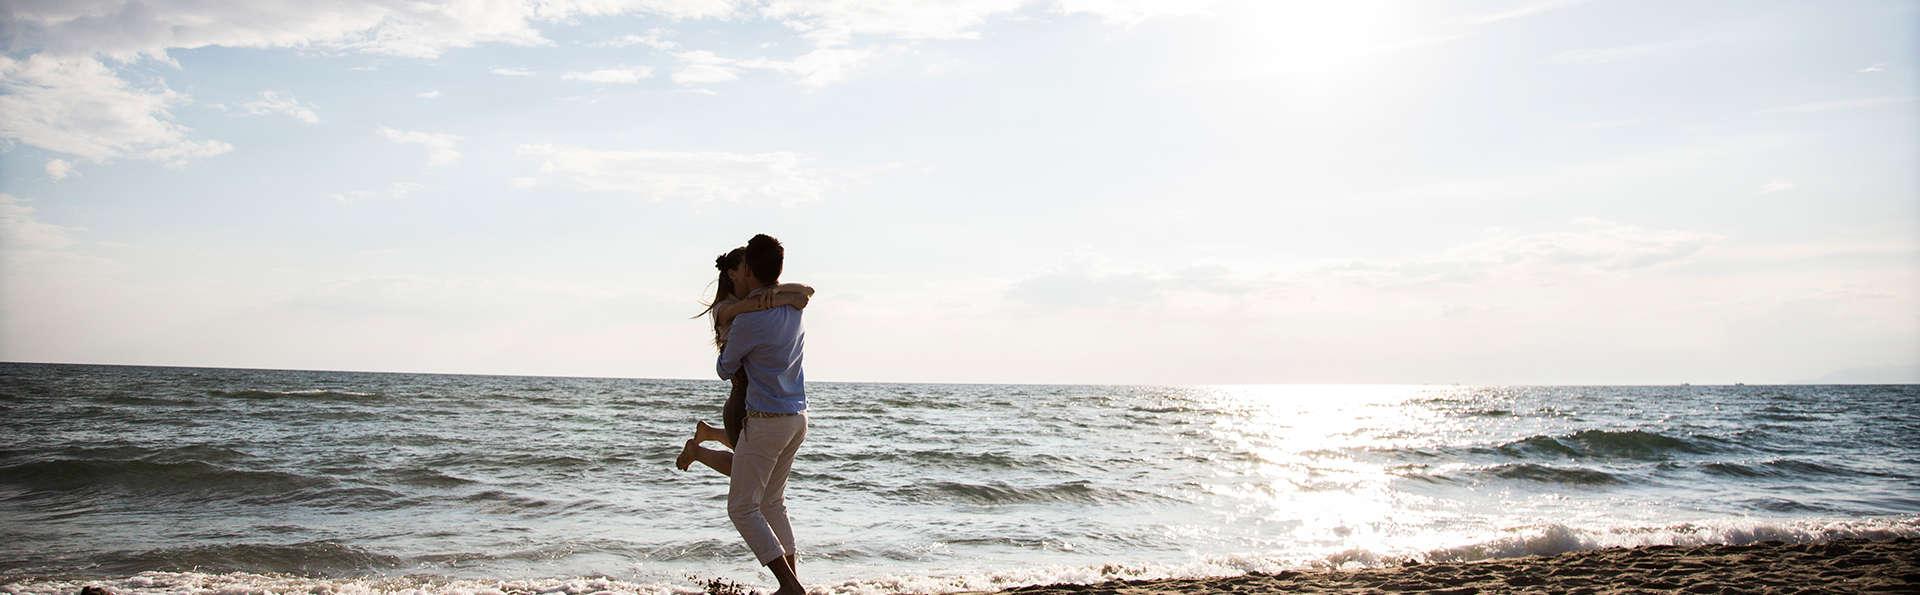 Escapade romantique avec cava et départ tardif à Puerto de Santa María